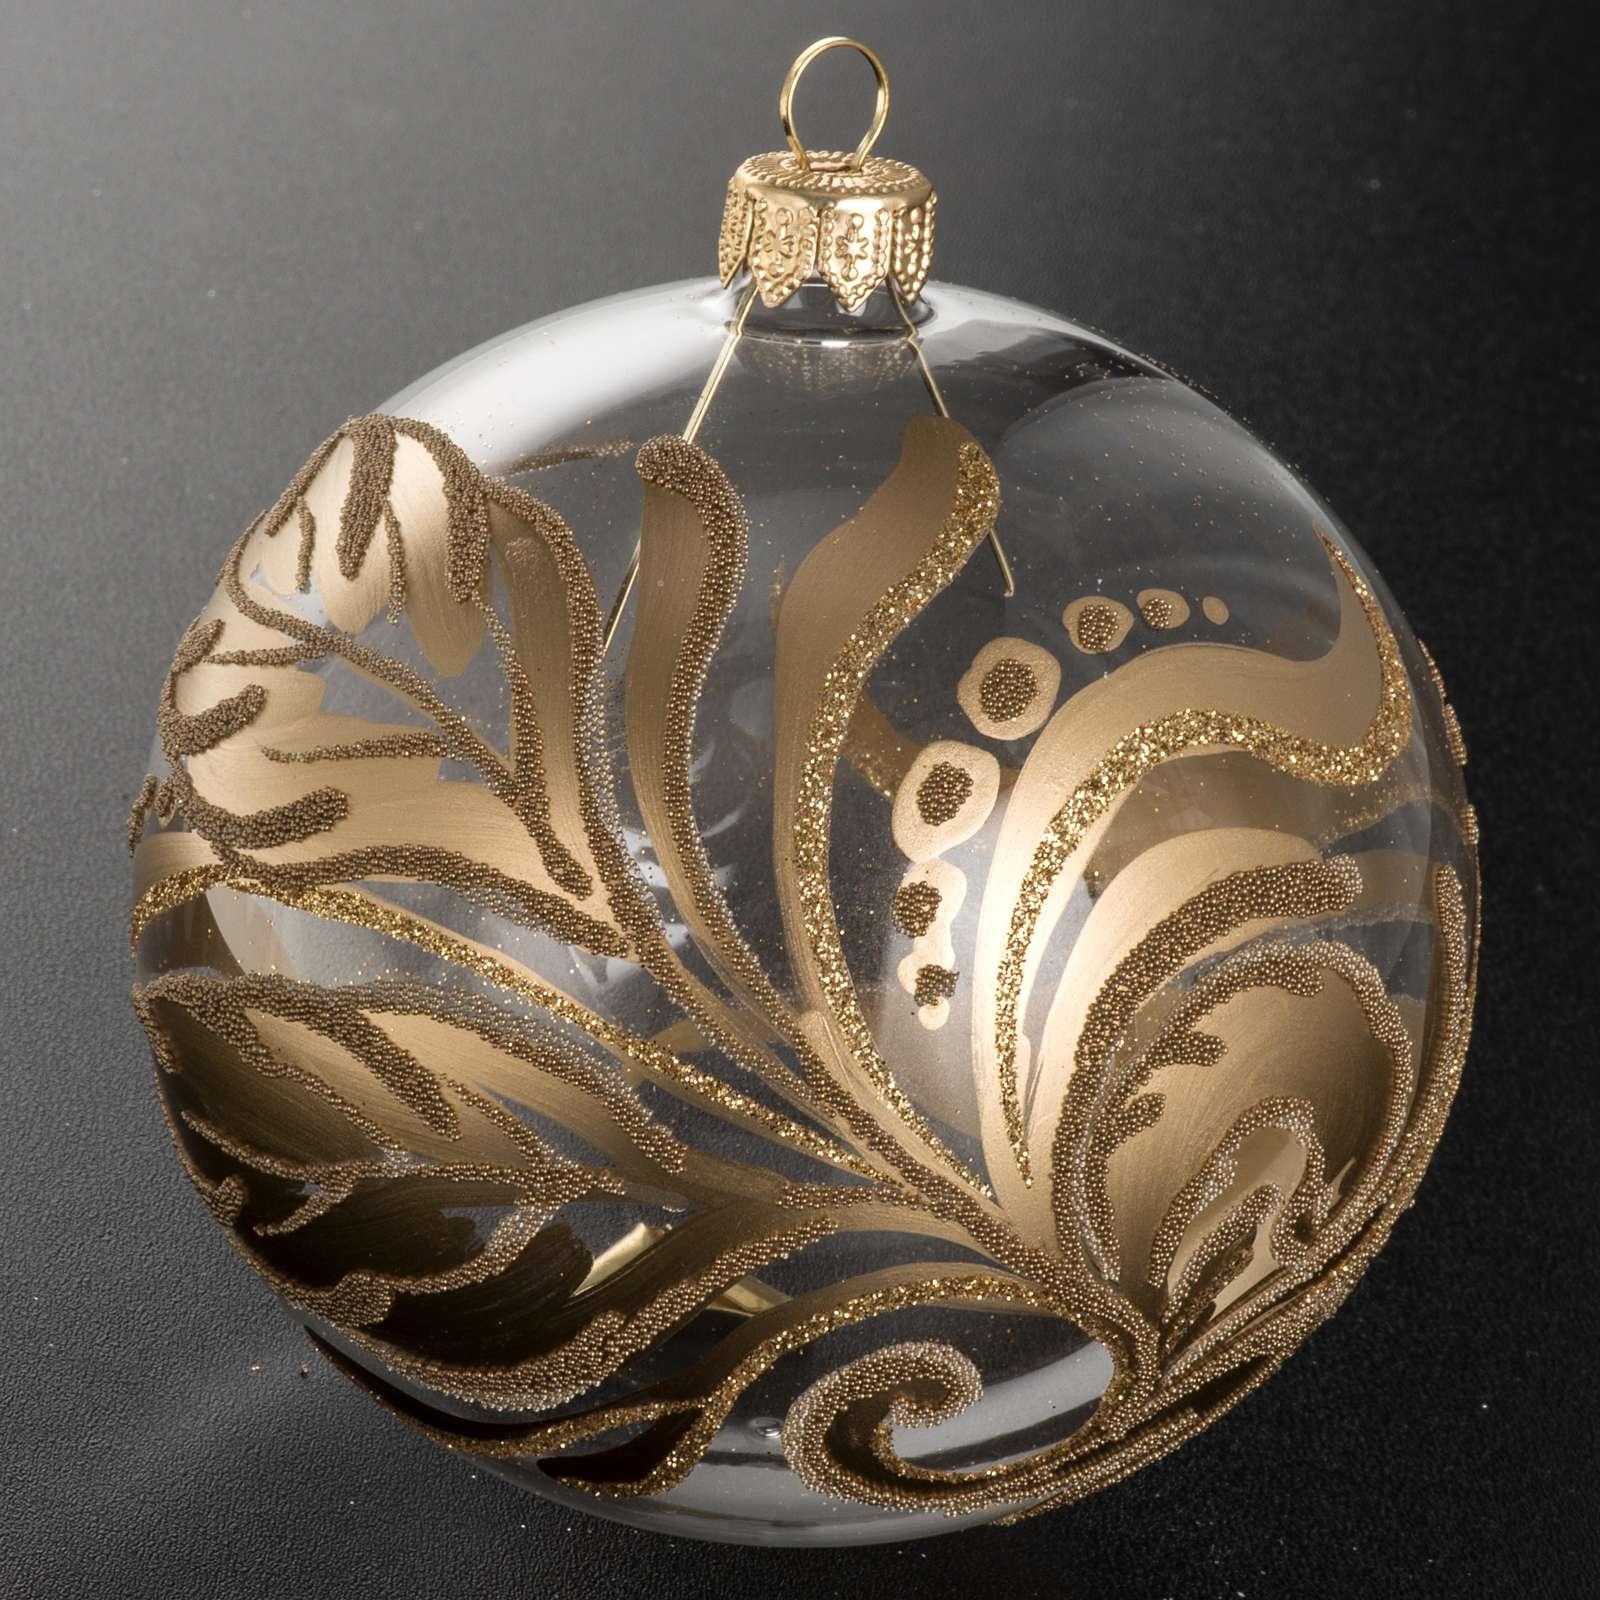 Christmas tree bauble, transparent glass golden decorations 10cm 4